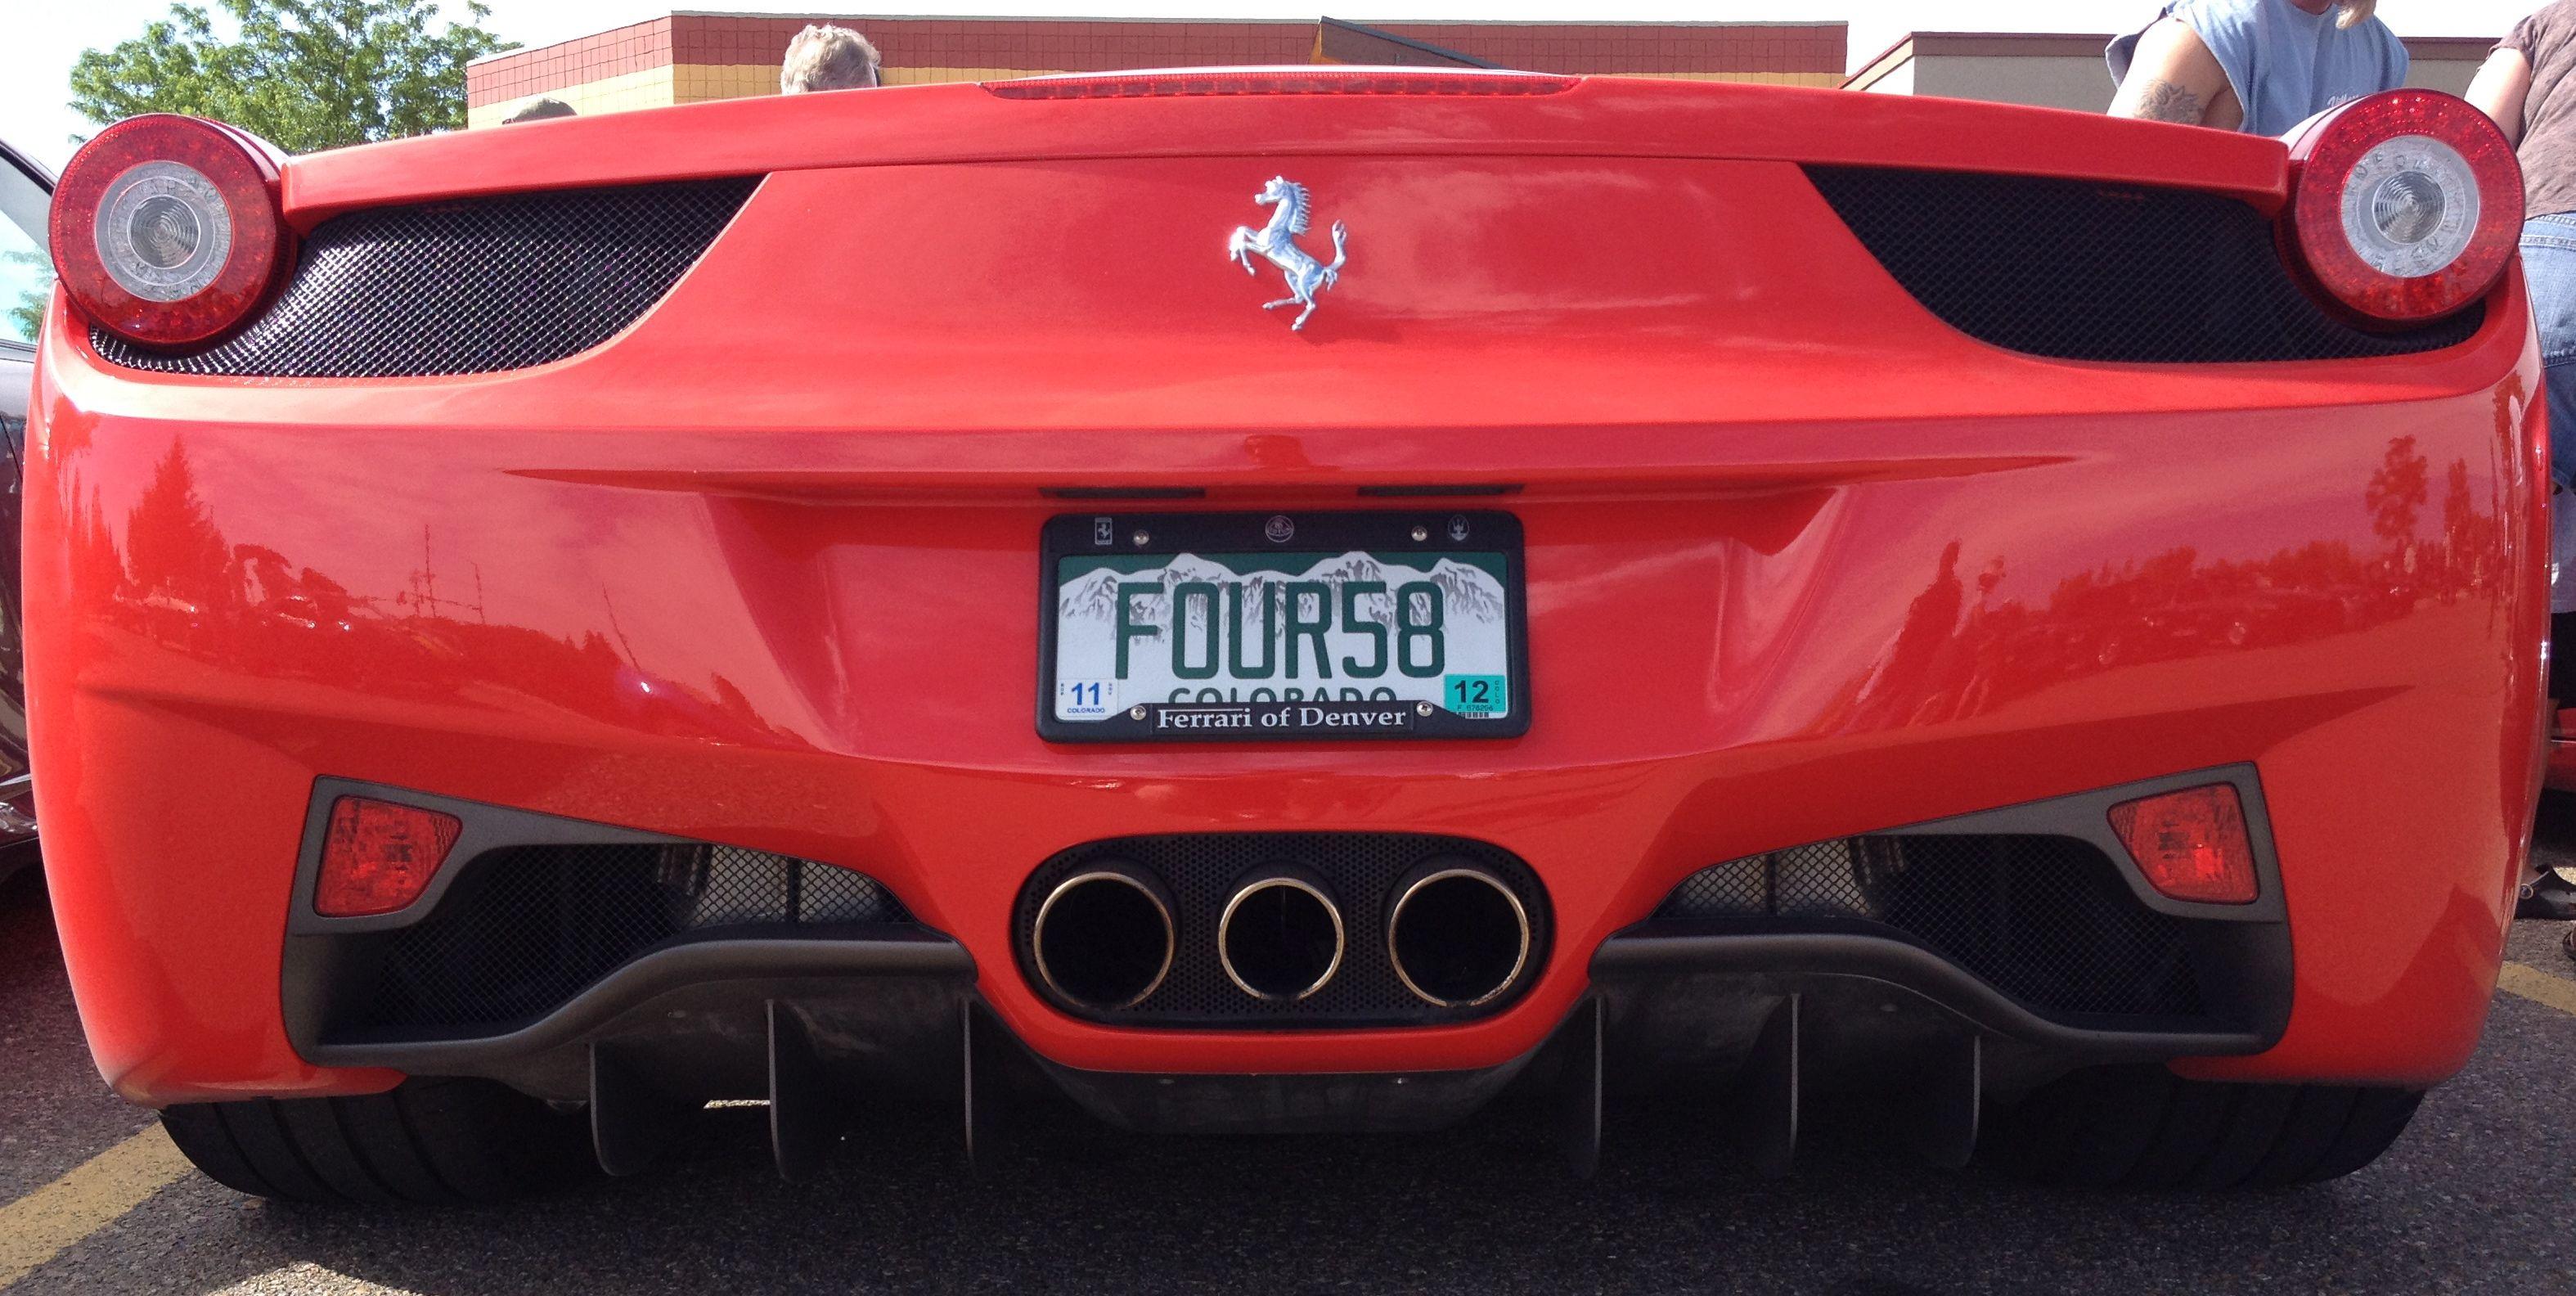 Ferrari 458 italia license plate ferrari car bmw car